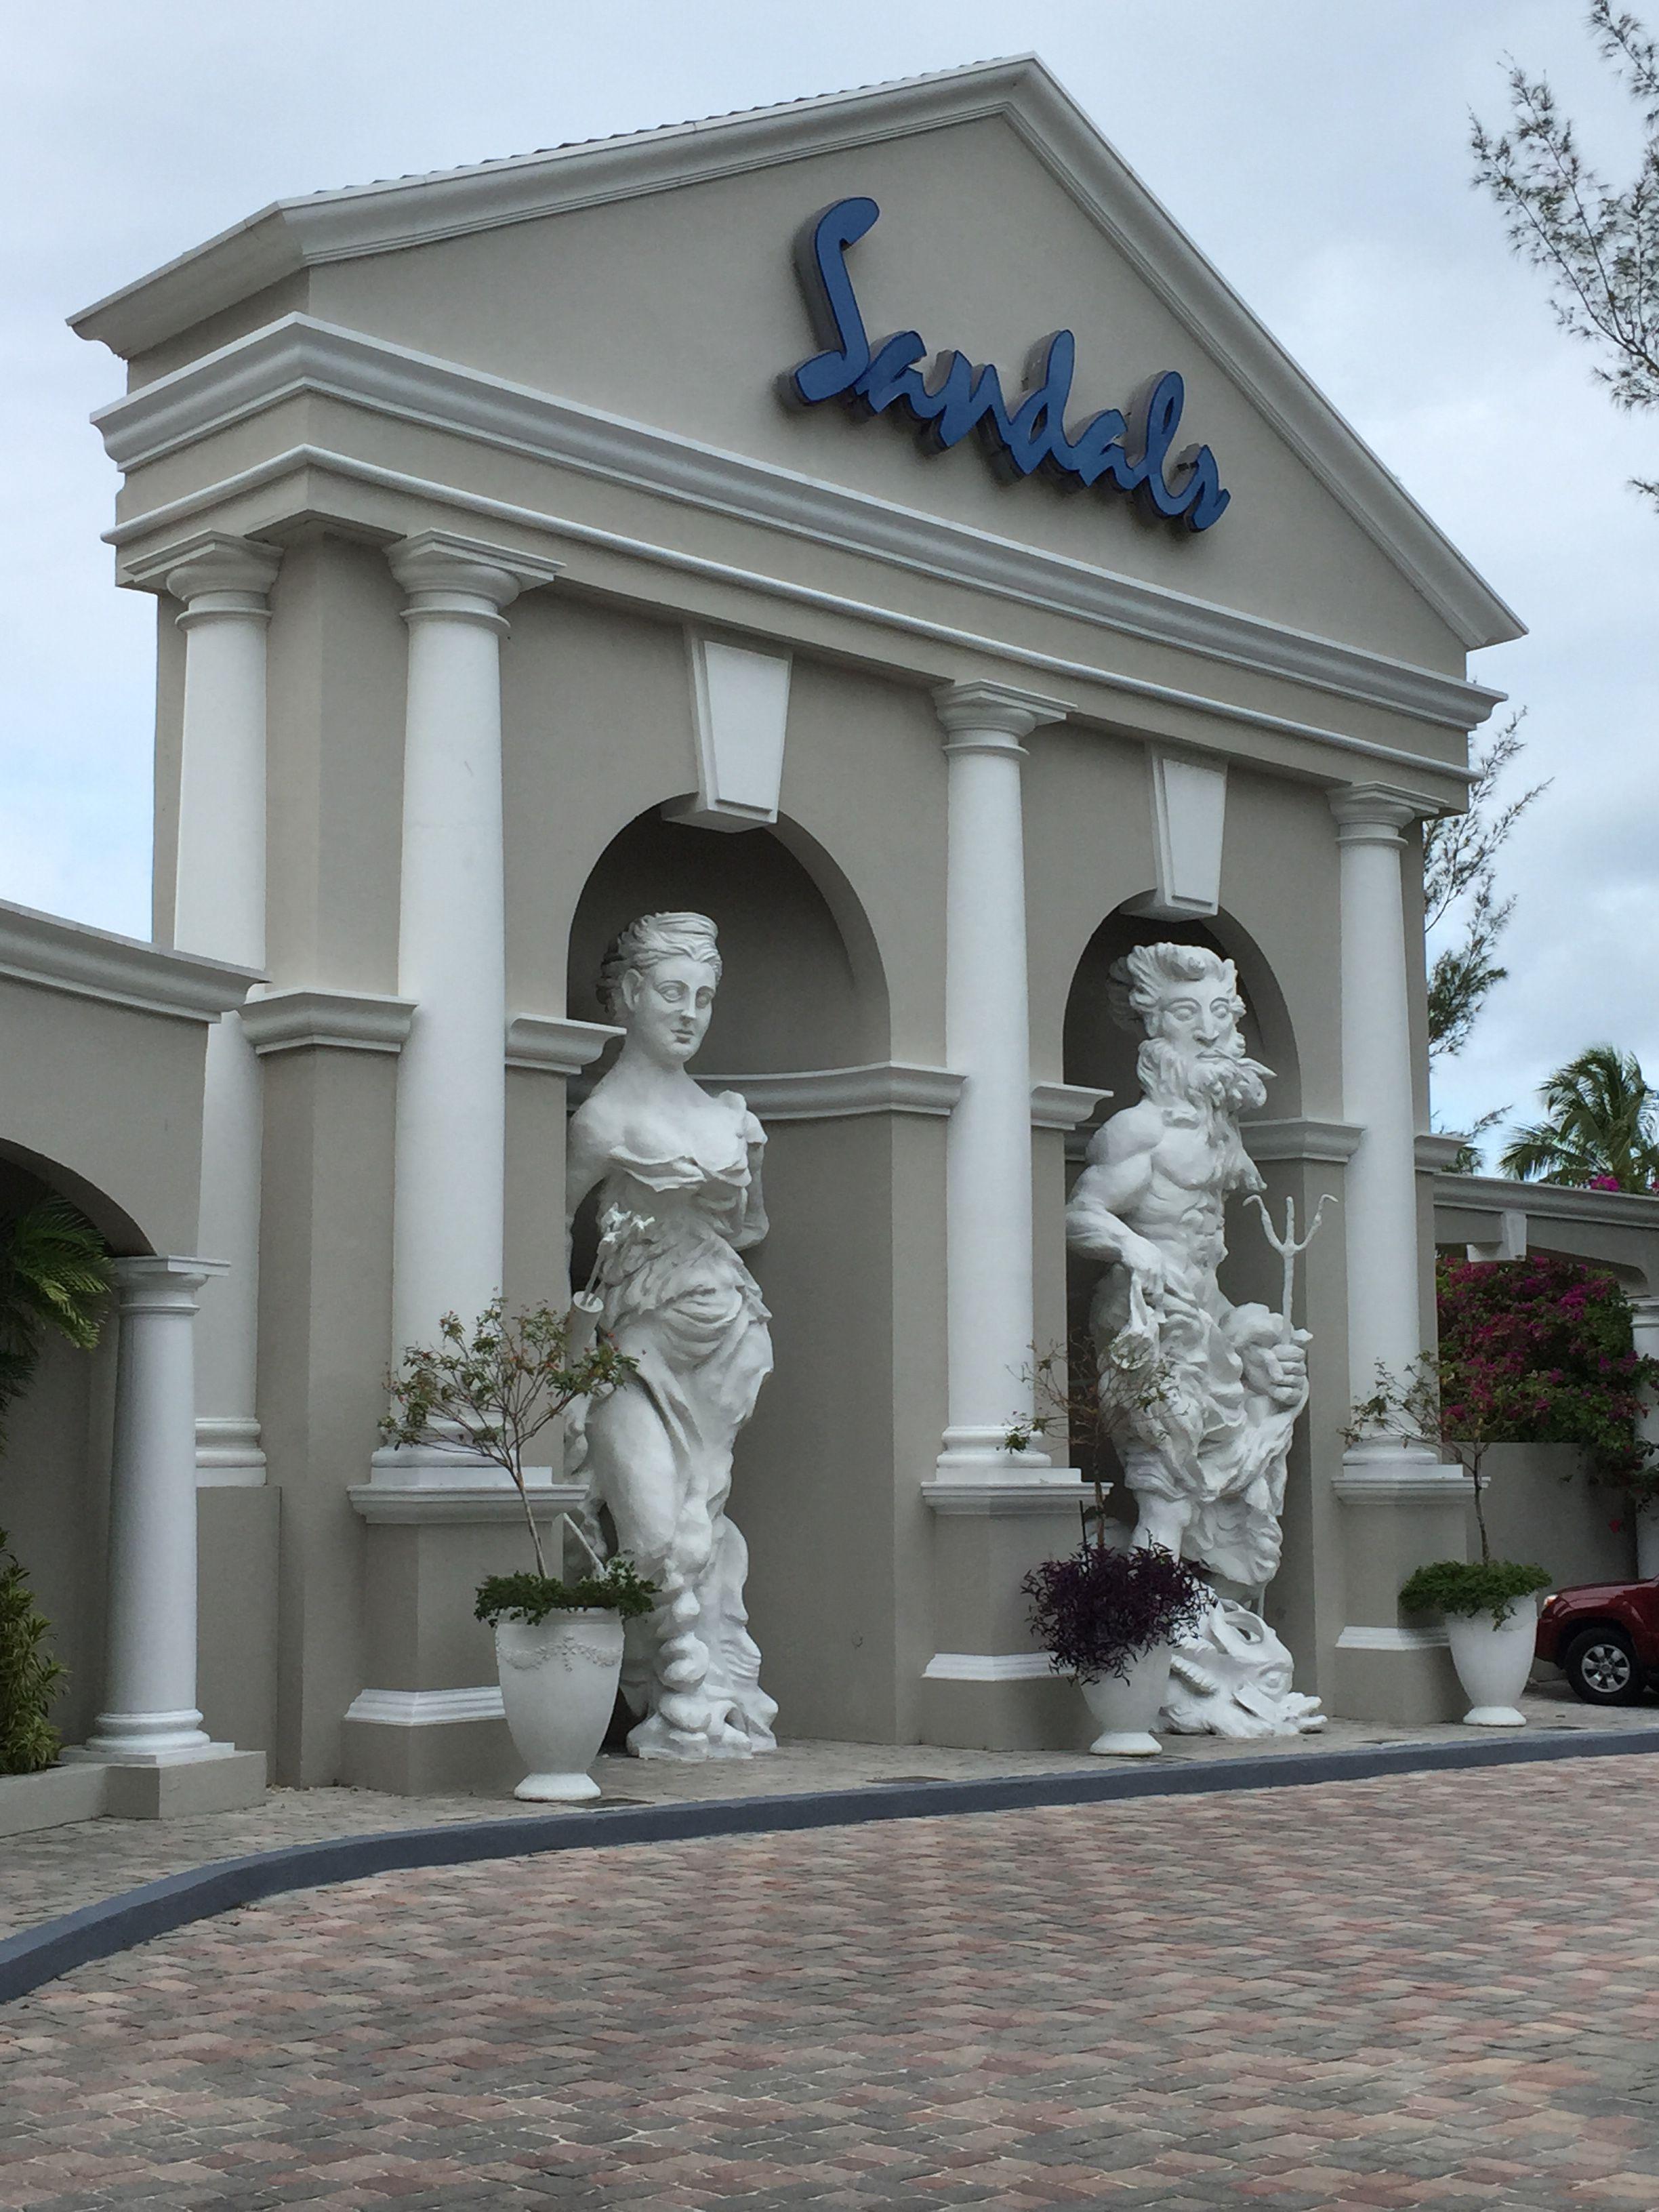 c65989aa910be3 Entrance to Sandals Royal Bahamian